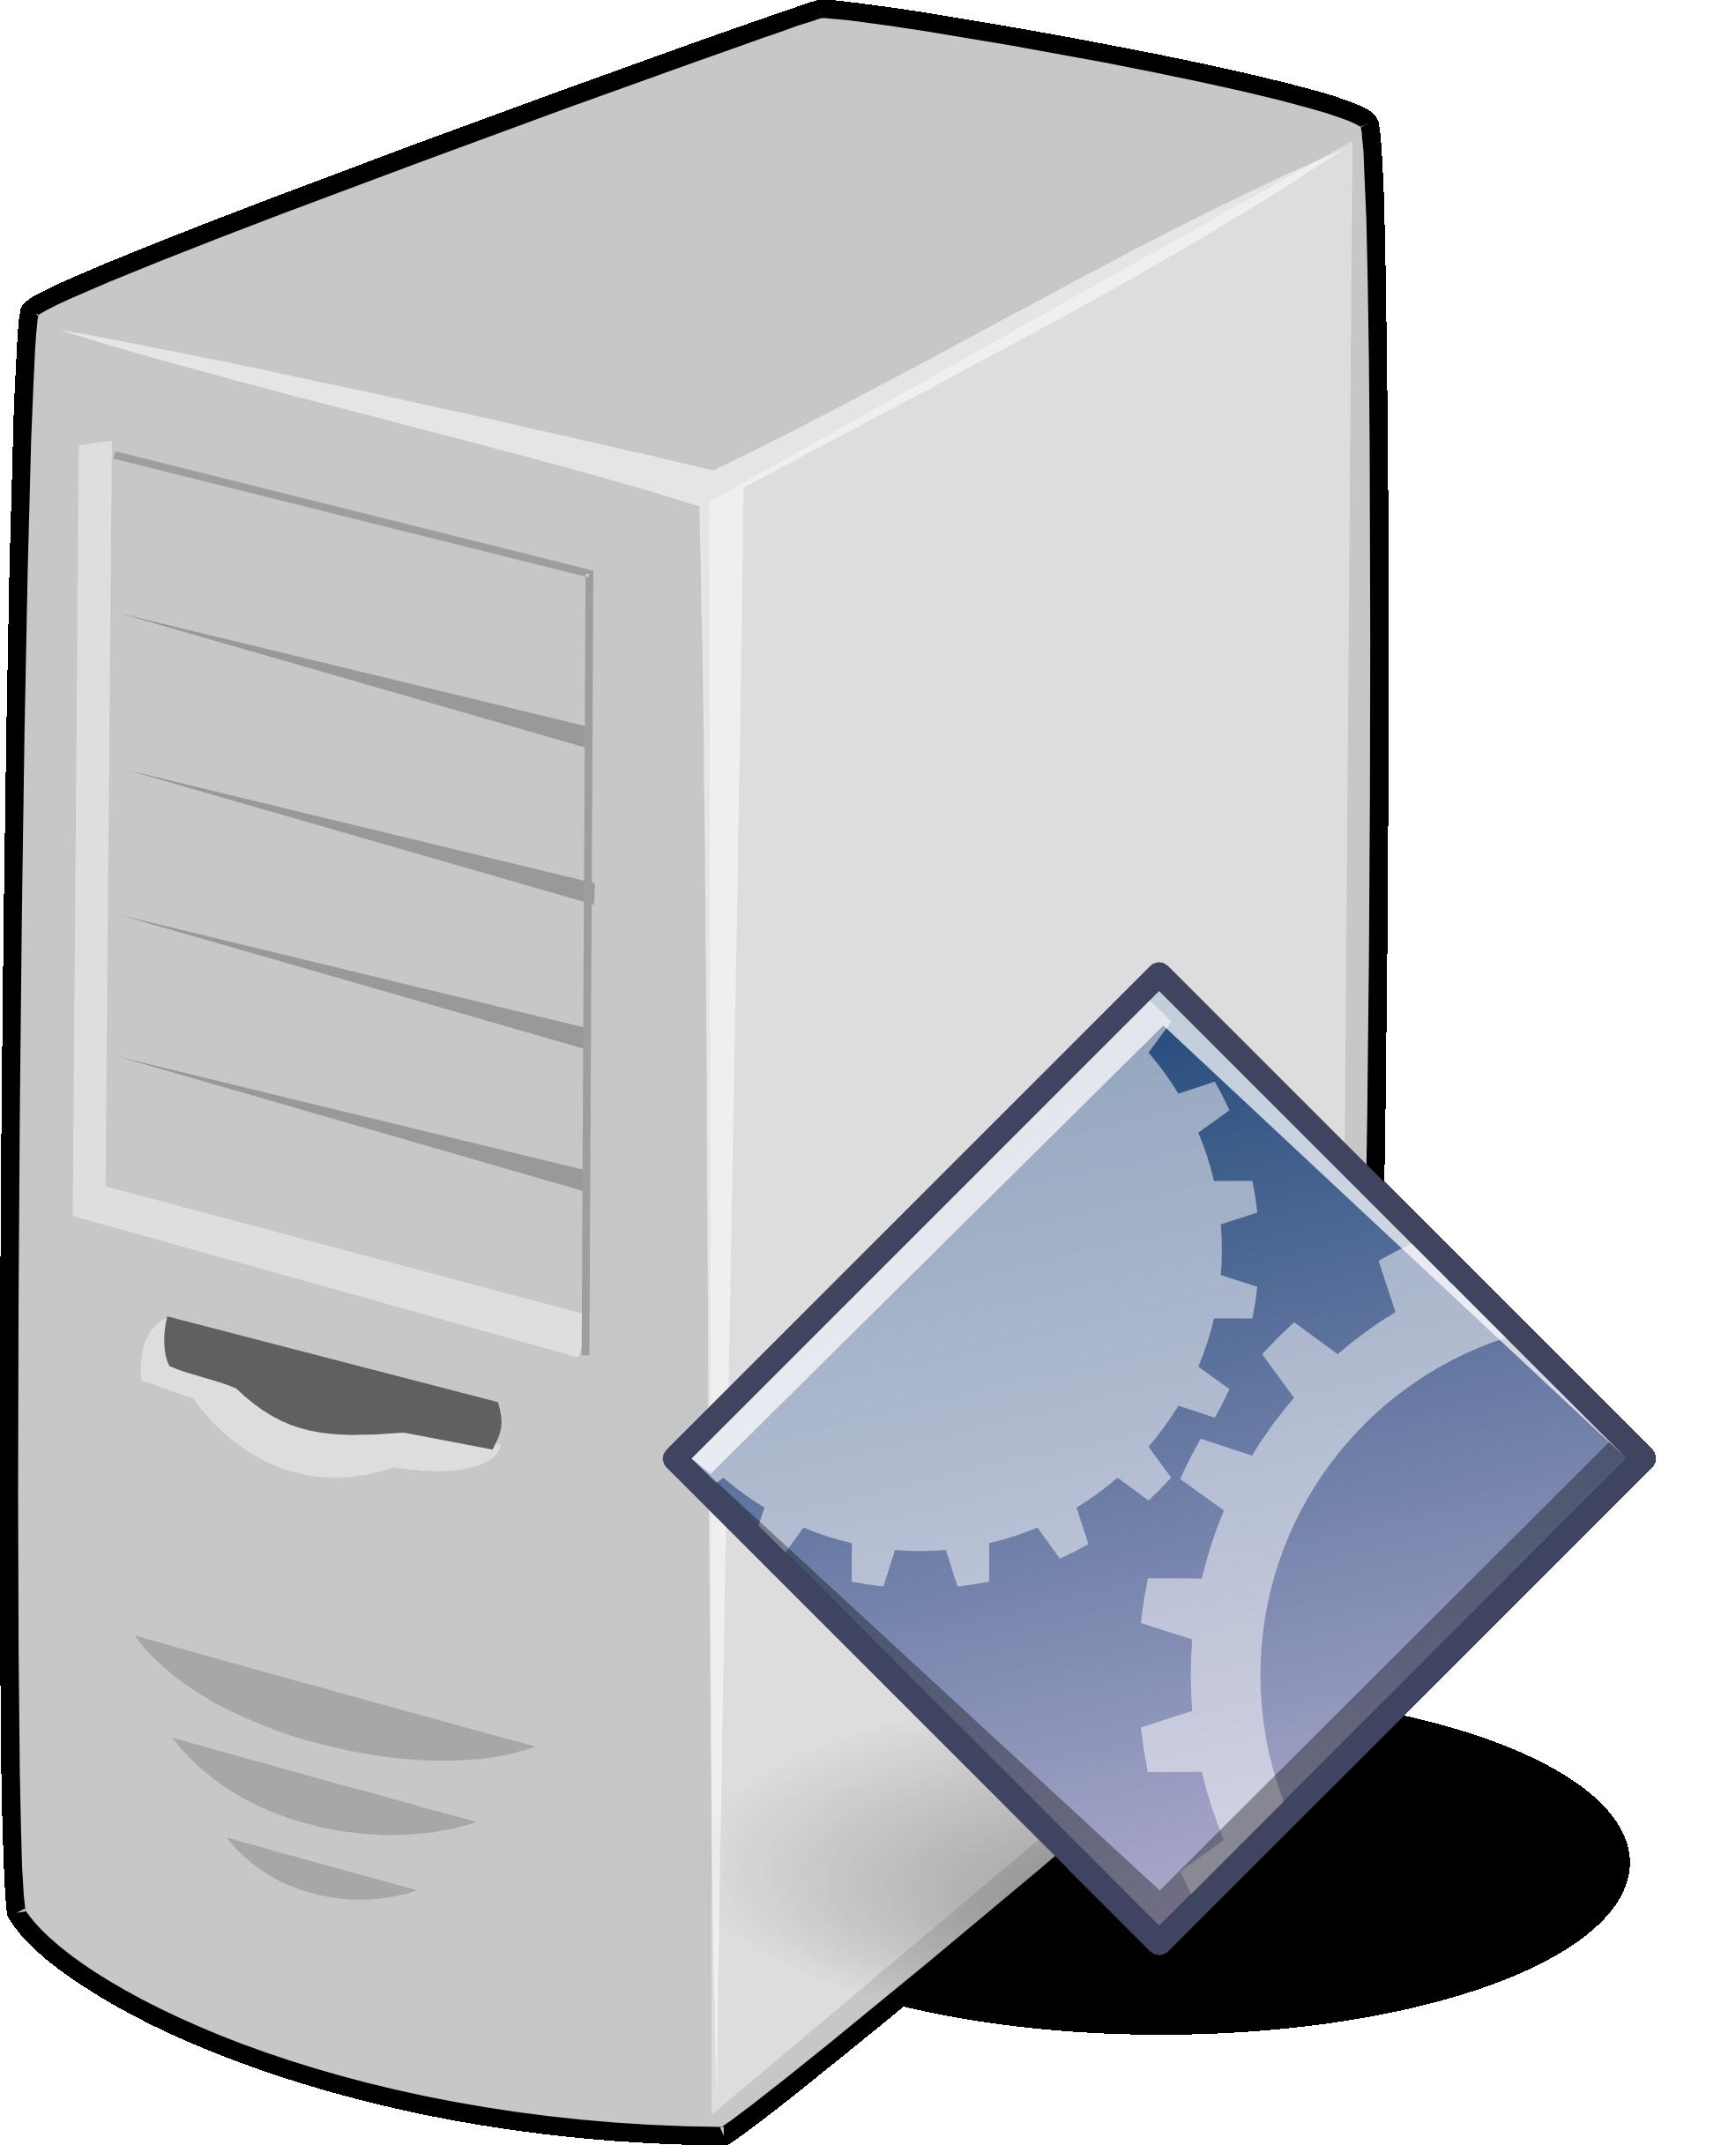 Web Server Clipart - ClipartFest-Web server clipart - ClipartFest-19